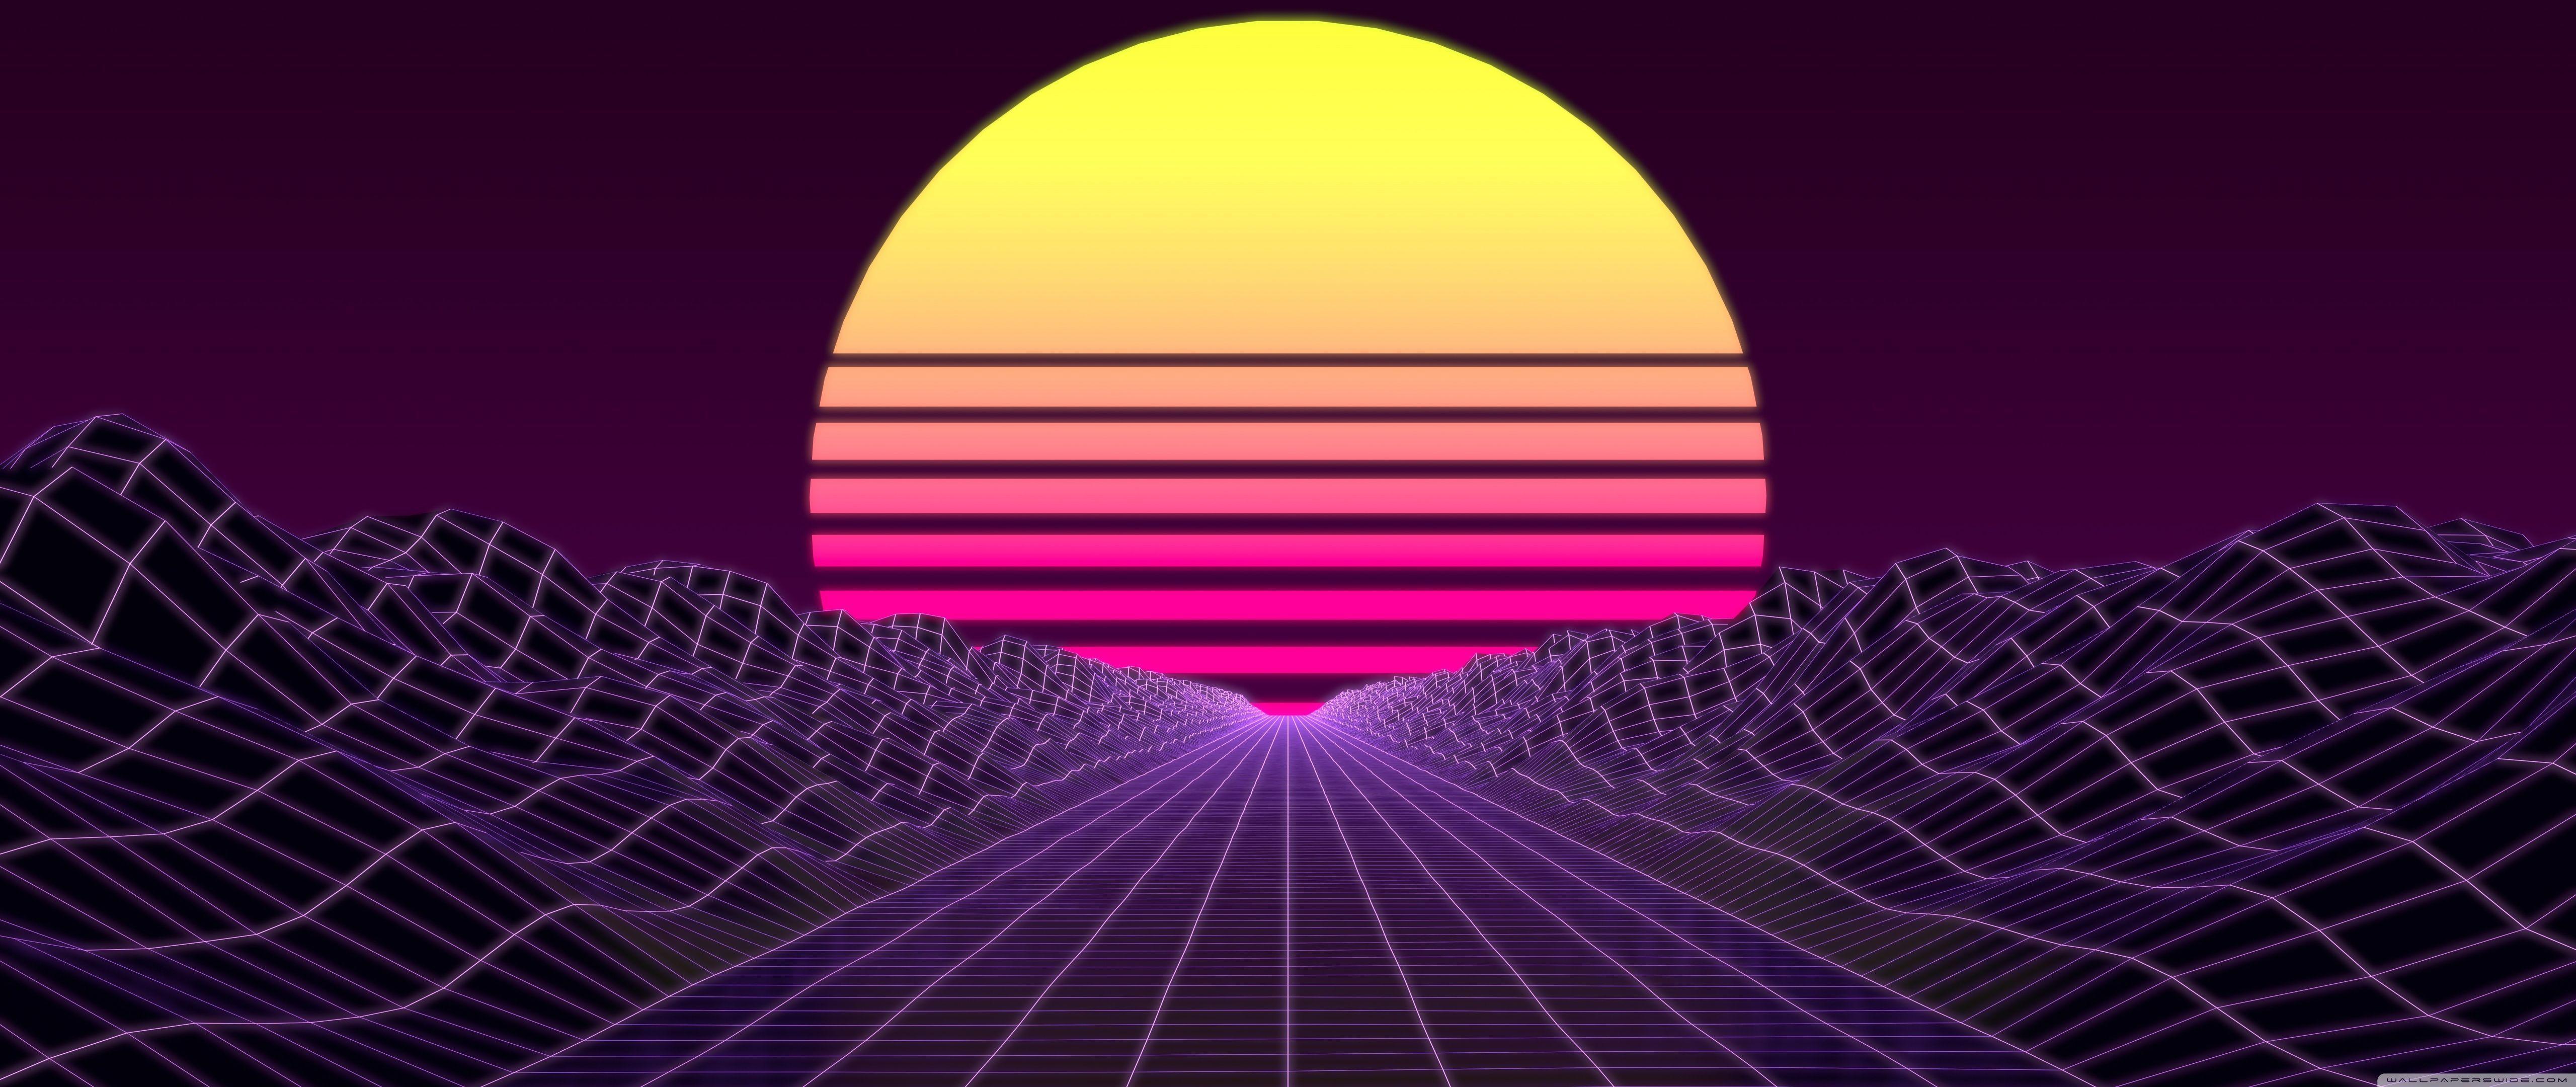 Synthwave Desktop Wallpapers Wallpaper Cave